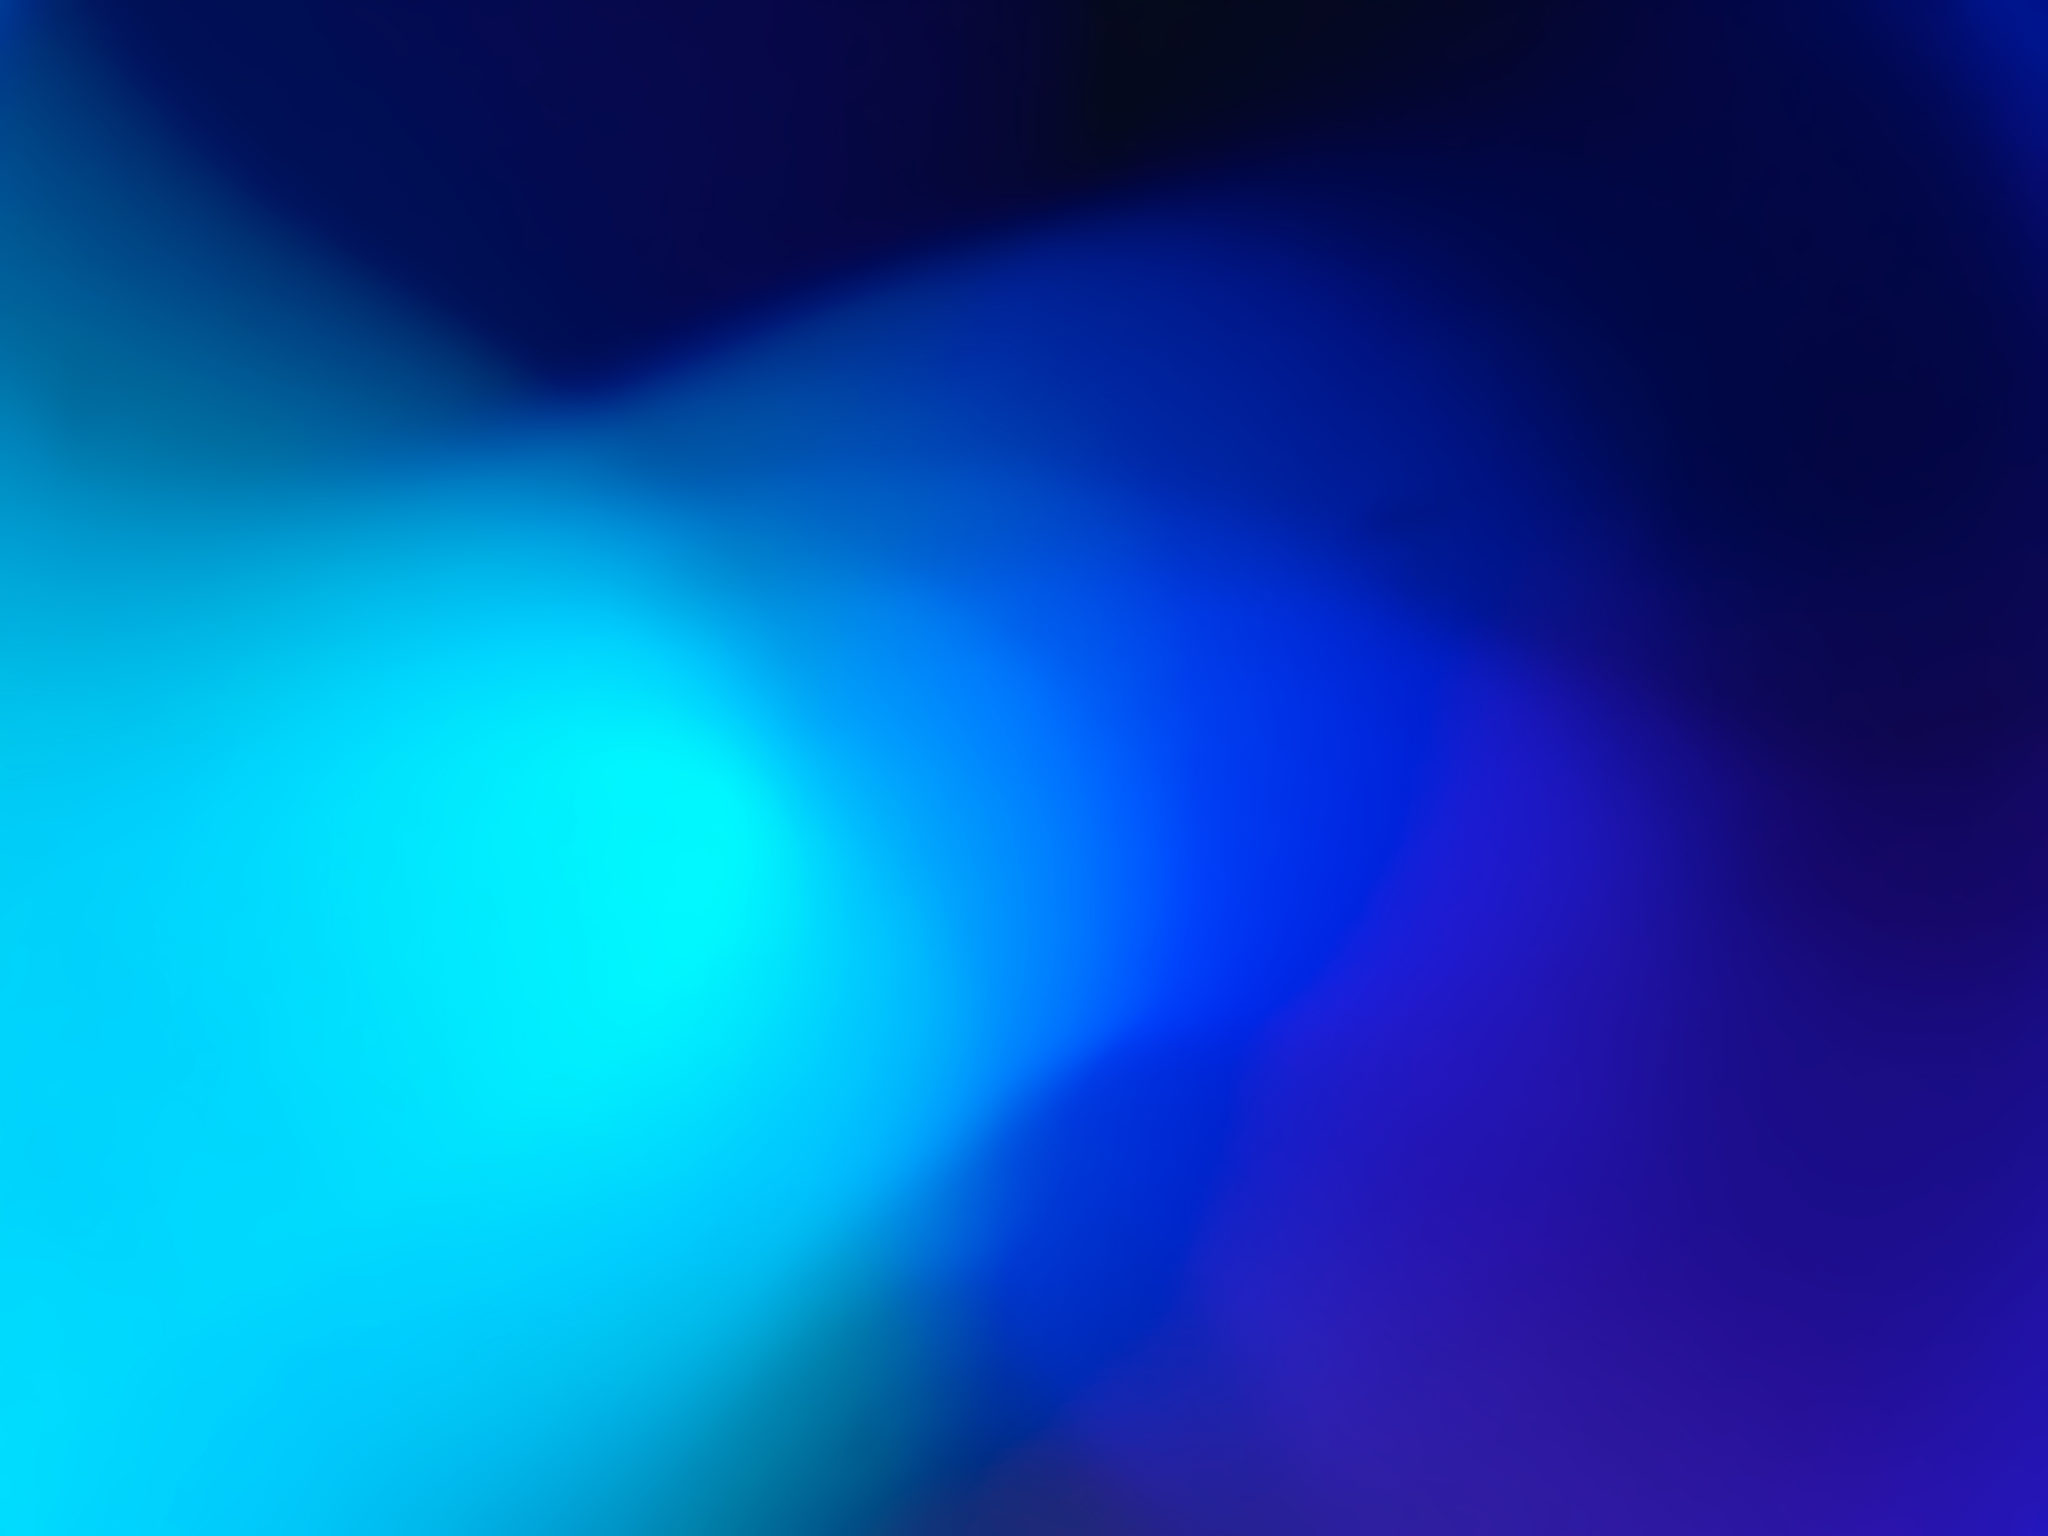 Blurred-Background-04